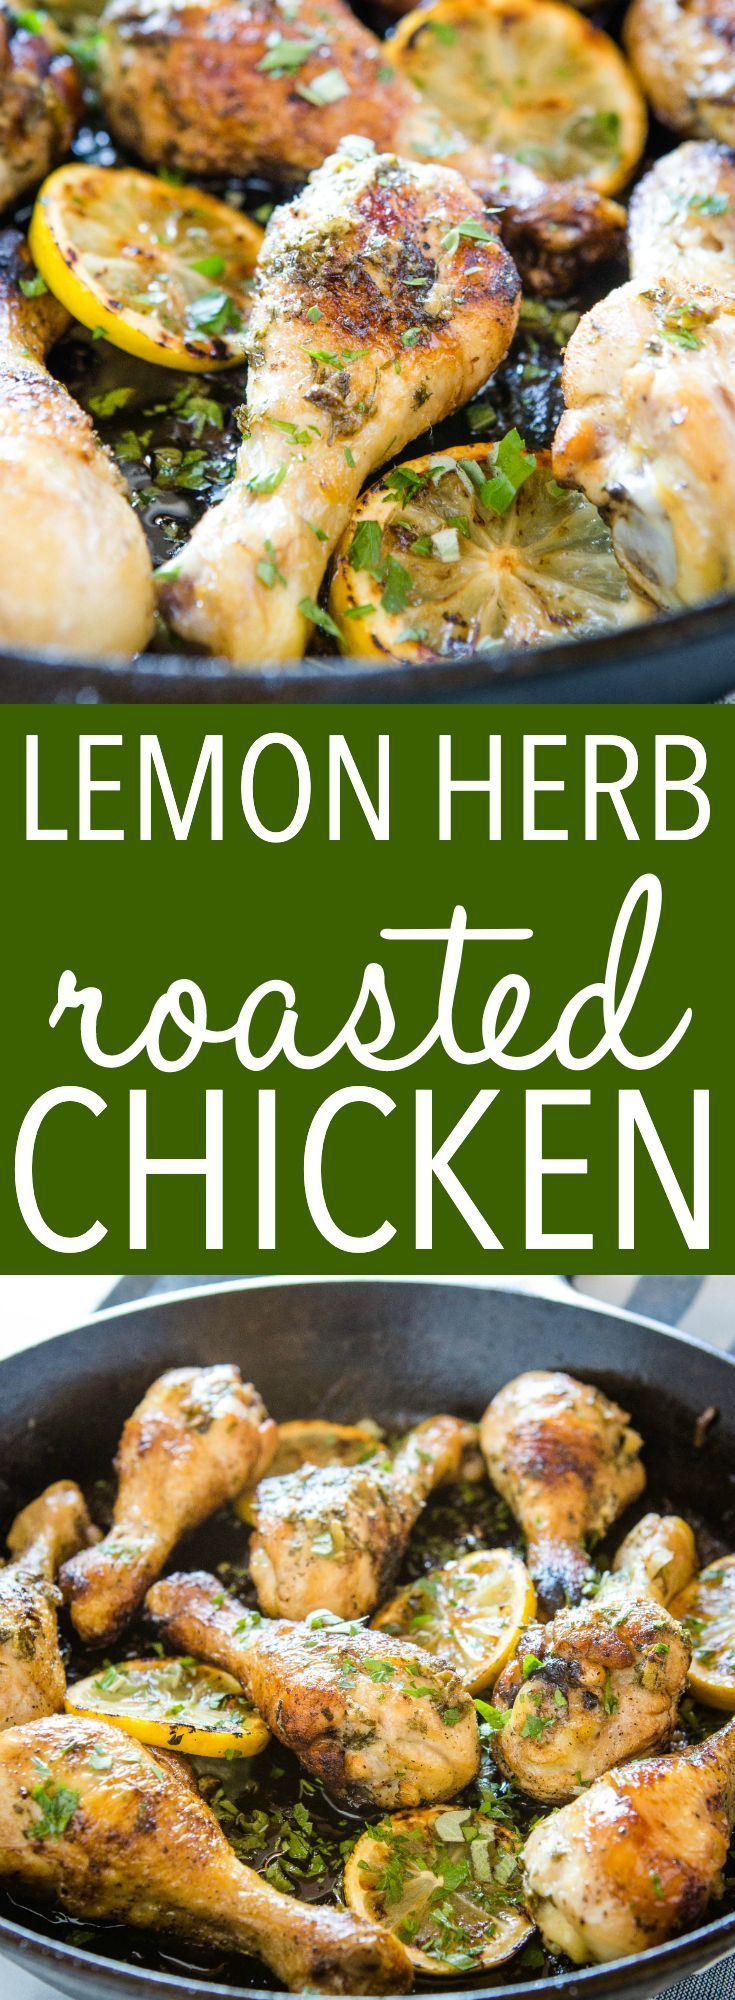 Easy Lemon Herb Roasted Chicken This Easy Lemon Herb Roasted Chicken is a delicious main dish made